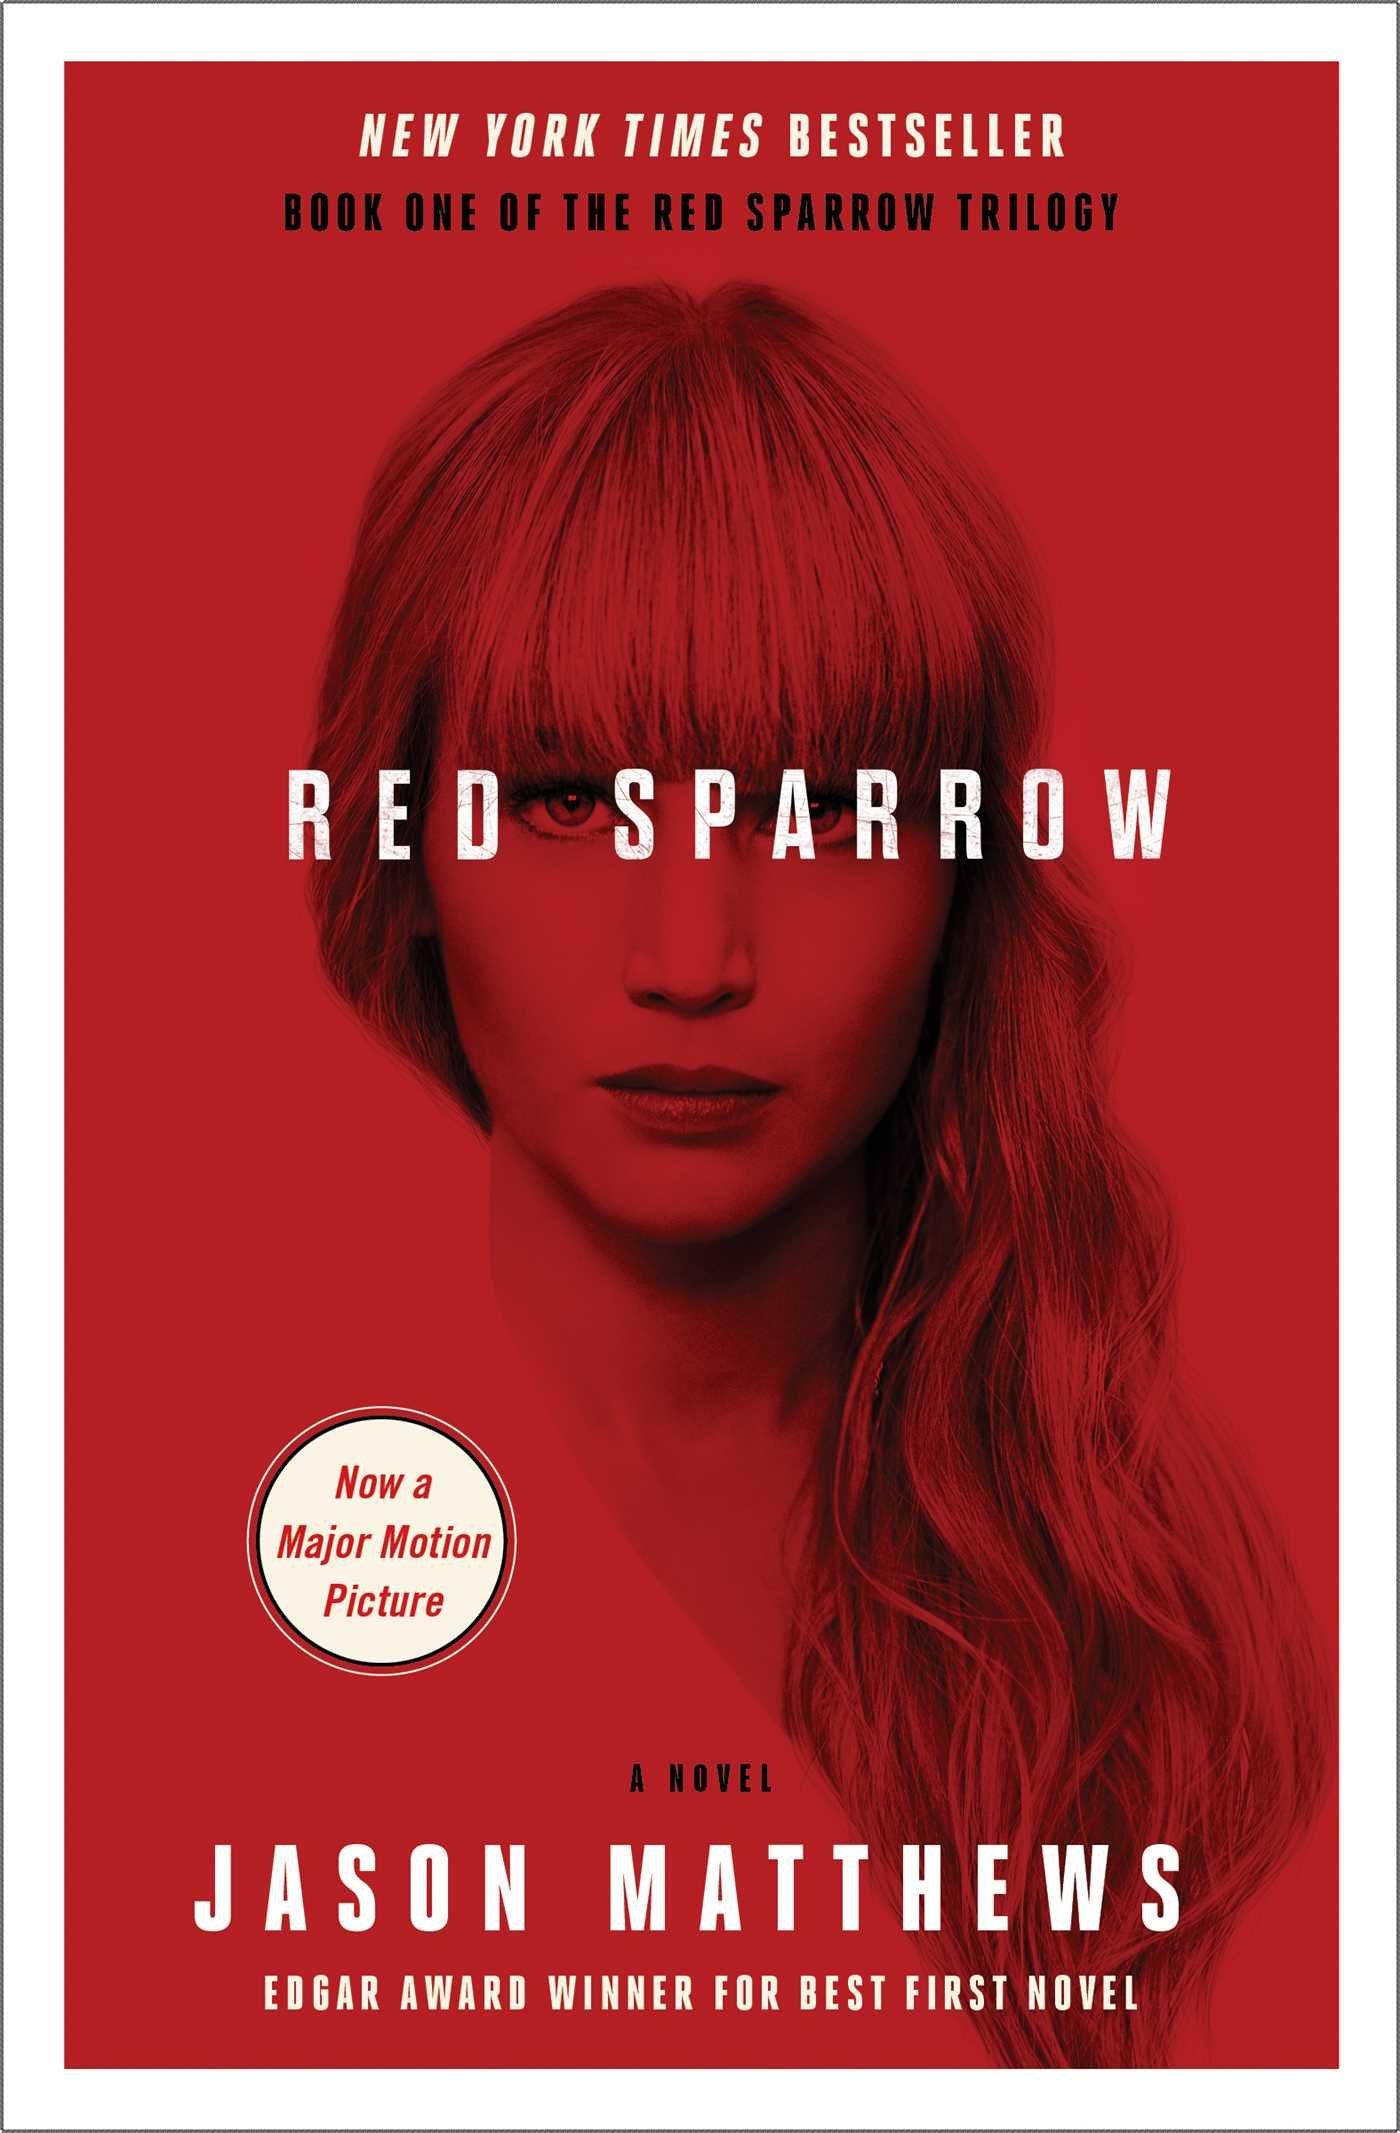 Amazon.com: Red Sparrow: A Novel (The Red Sparrow Trilogy Book 1) eBook:  Matthews, Jason: Kindle Store